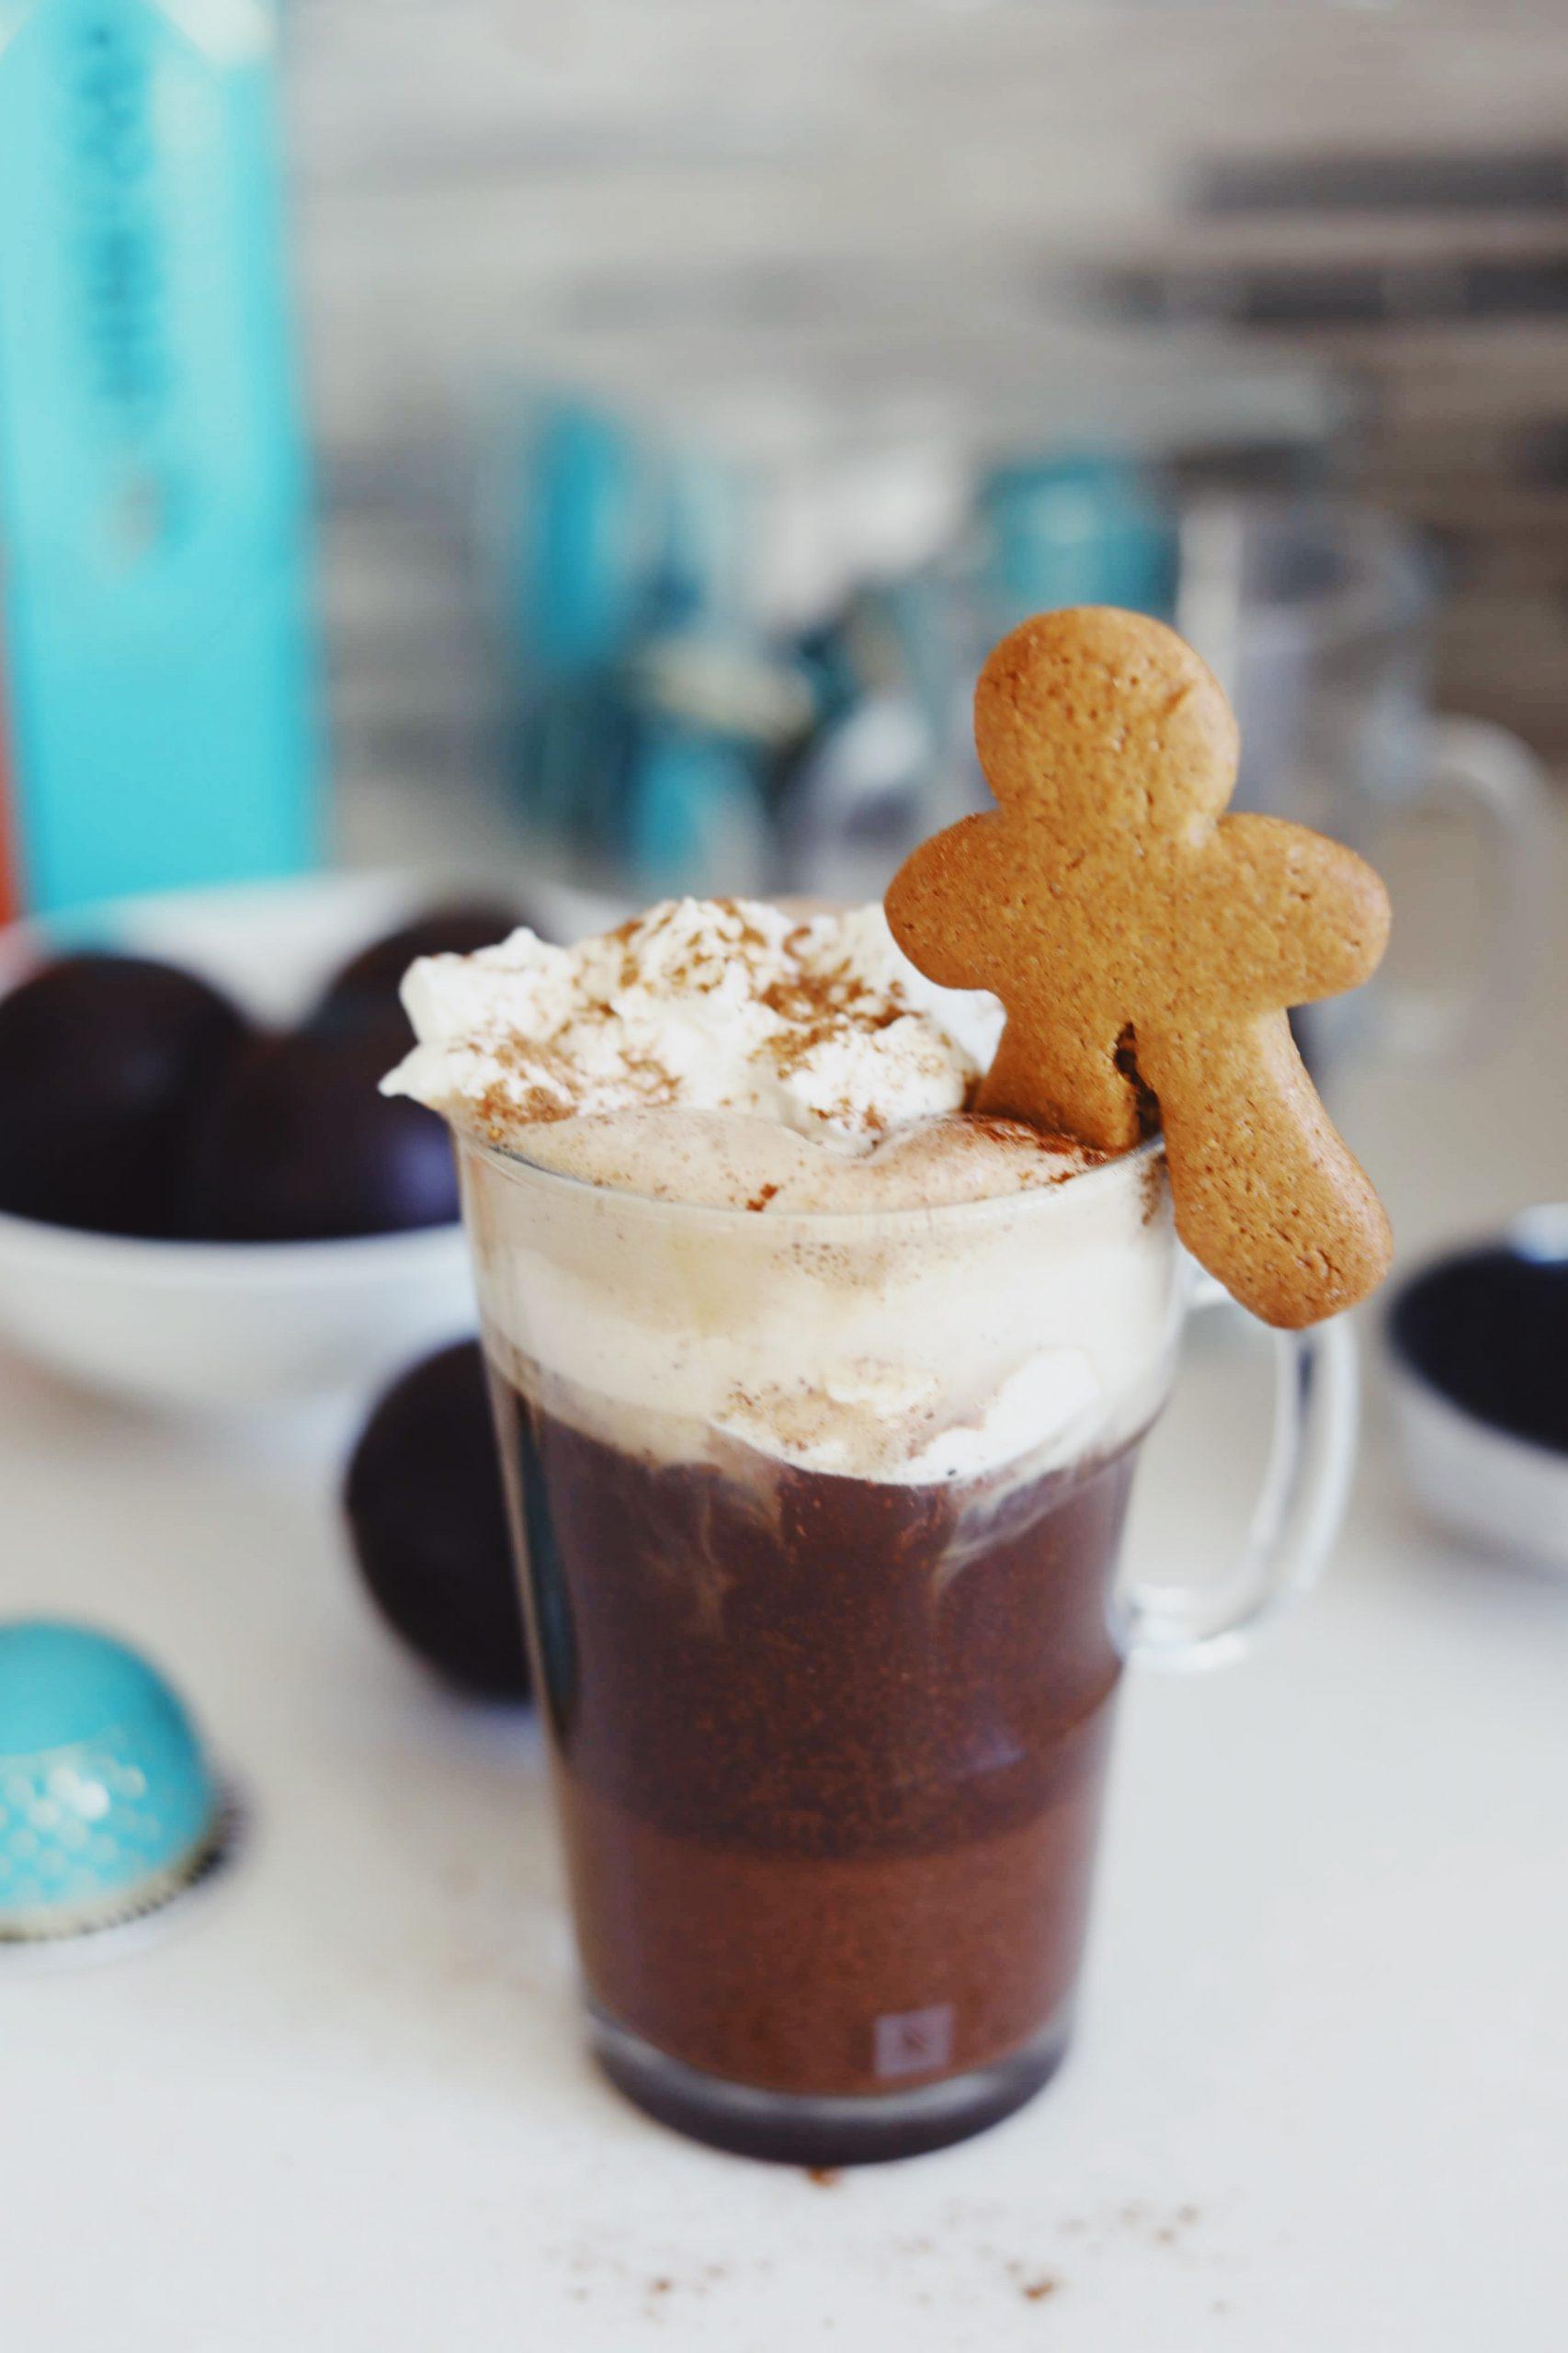 Julekrydret kaffedrik med brunkagesmag